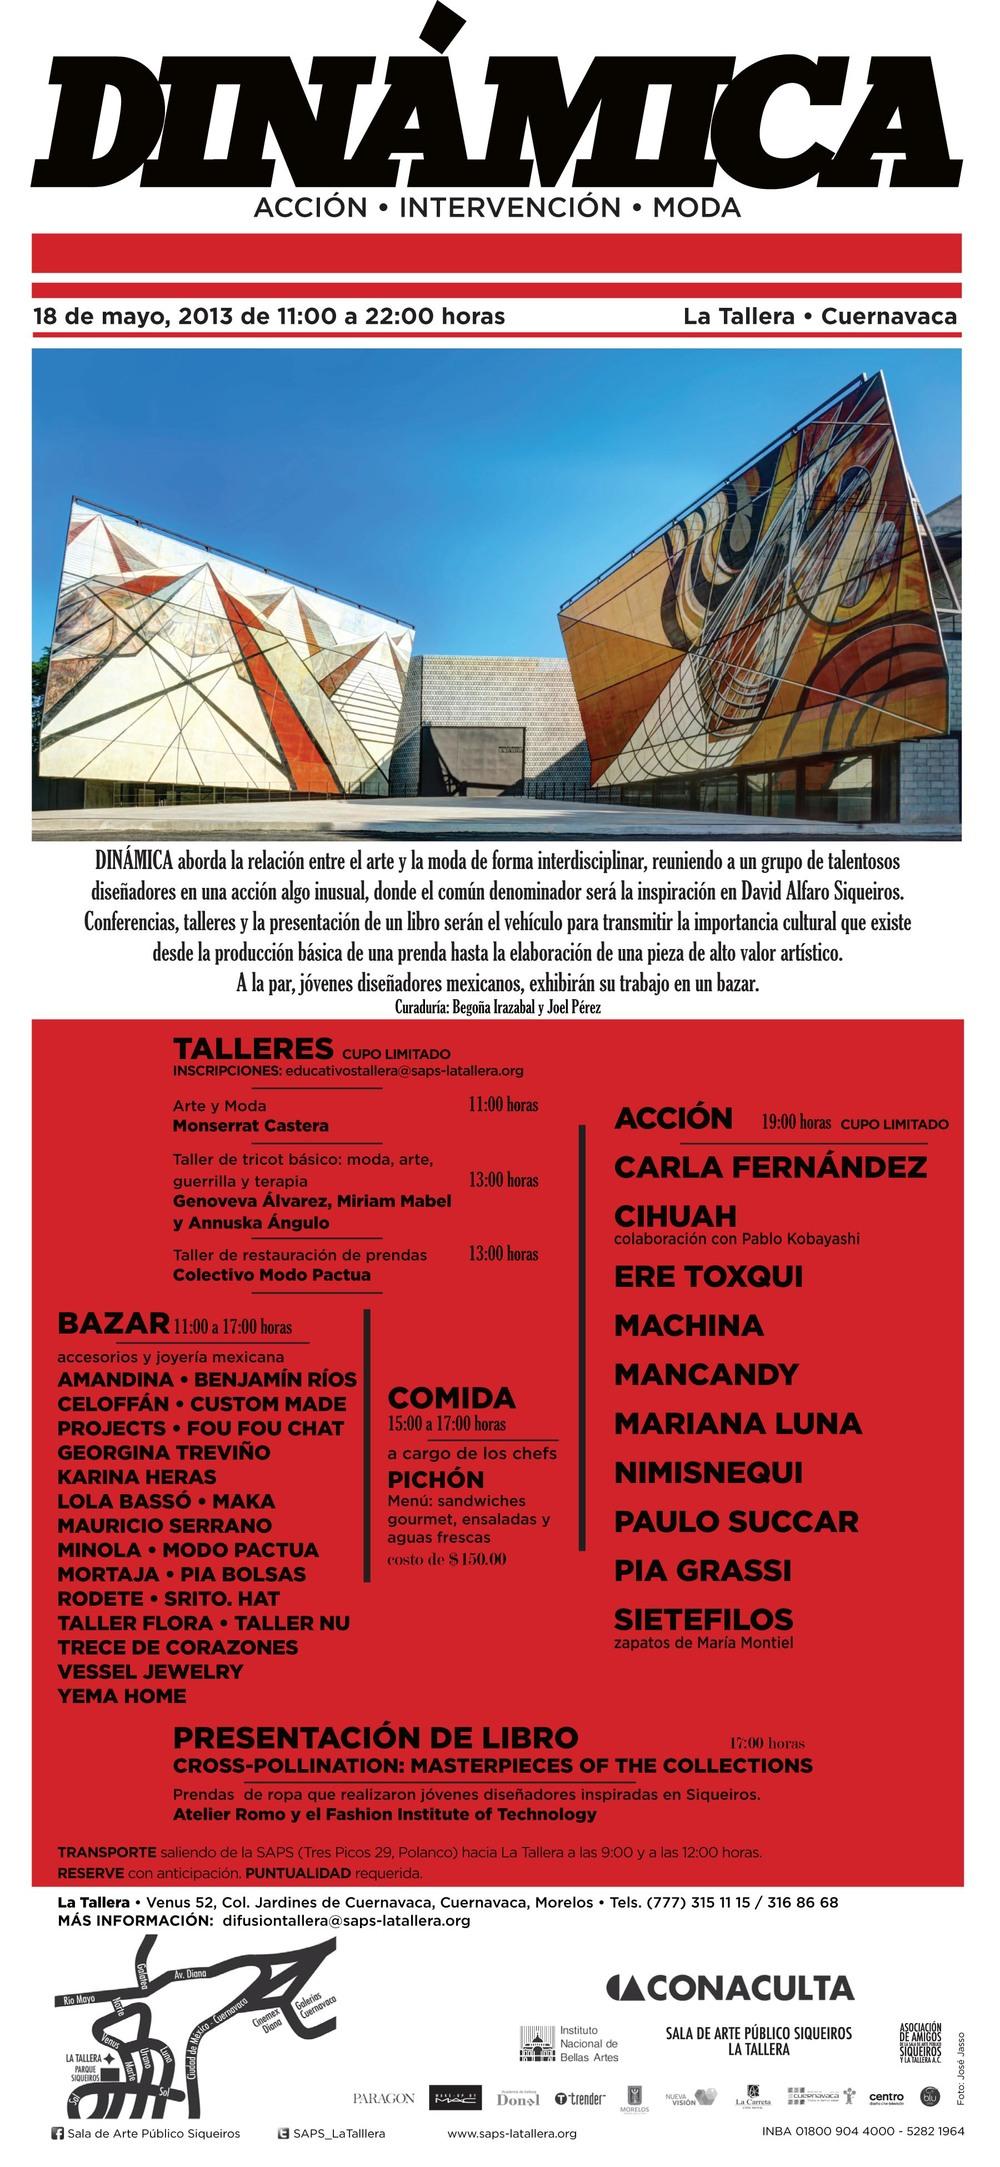 INVITACION DINÁMICA.jpg